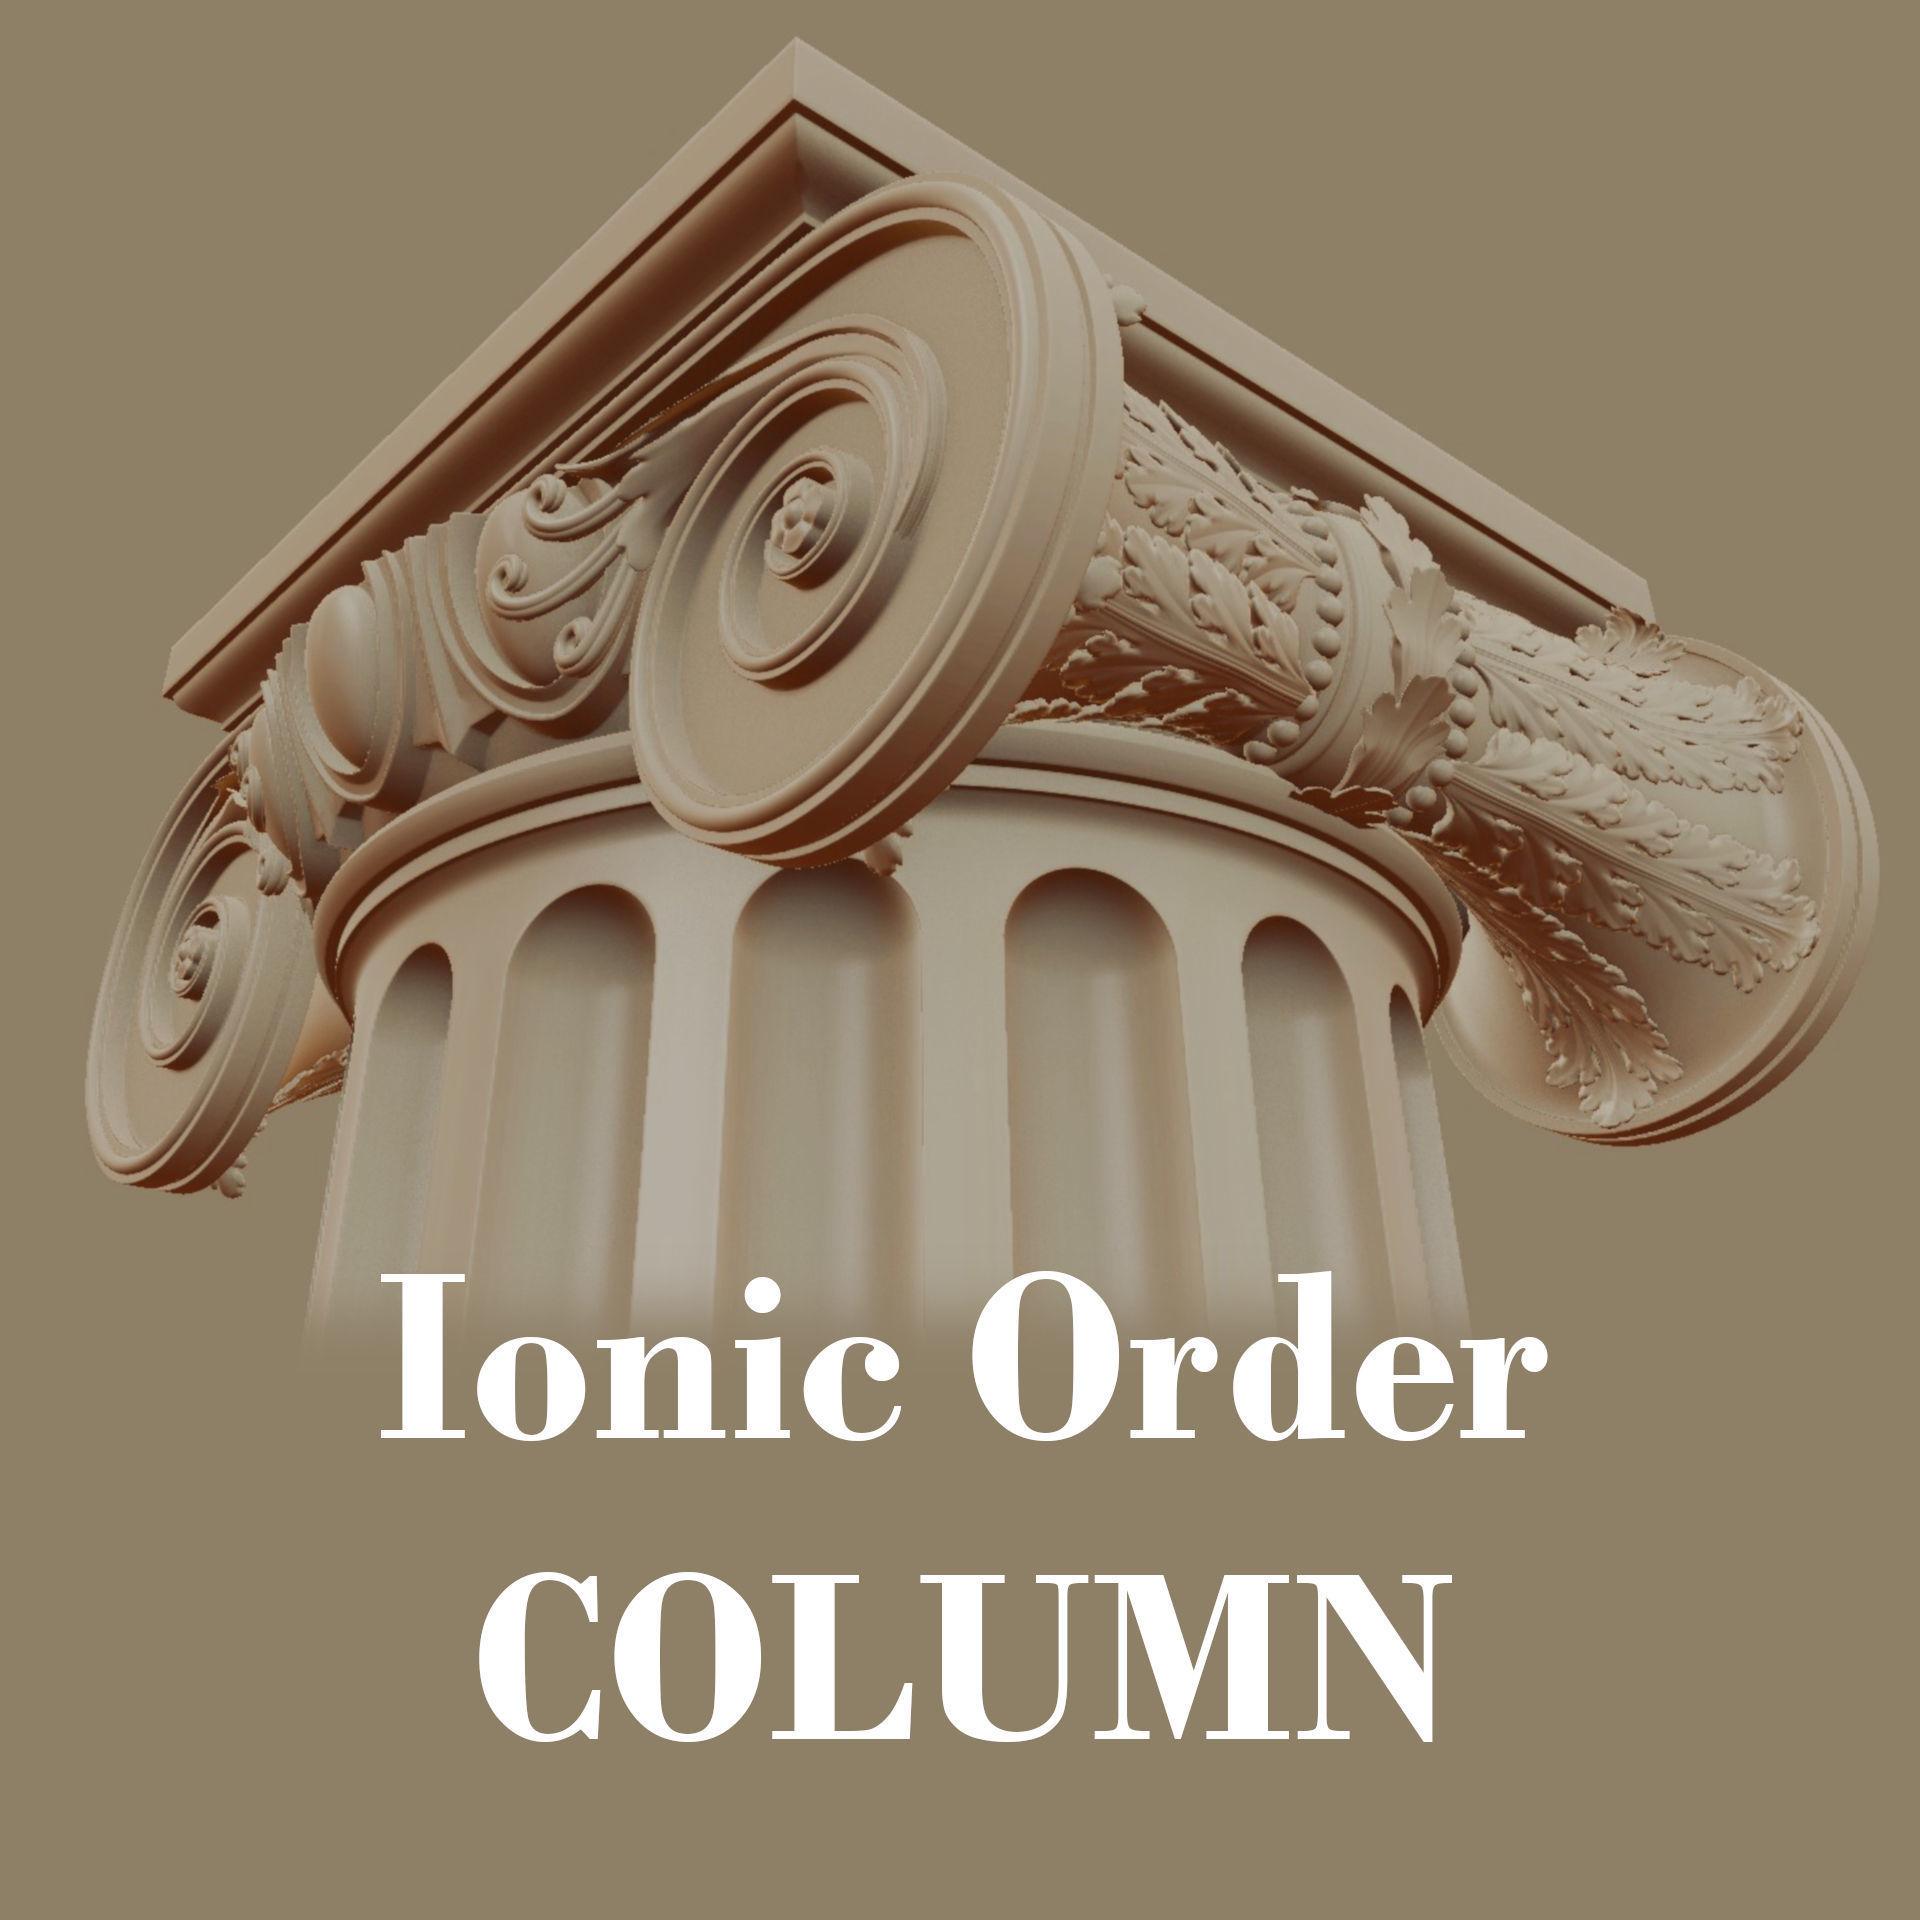 Ionic order - COLUMN